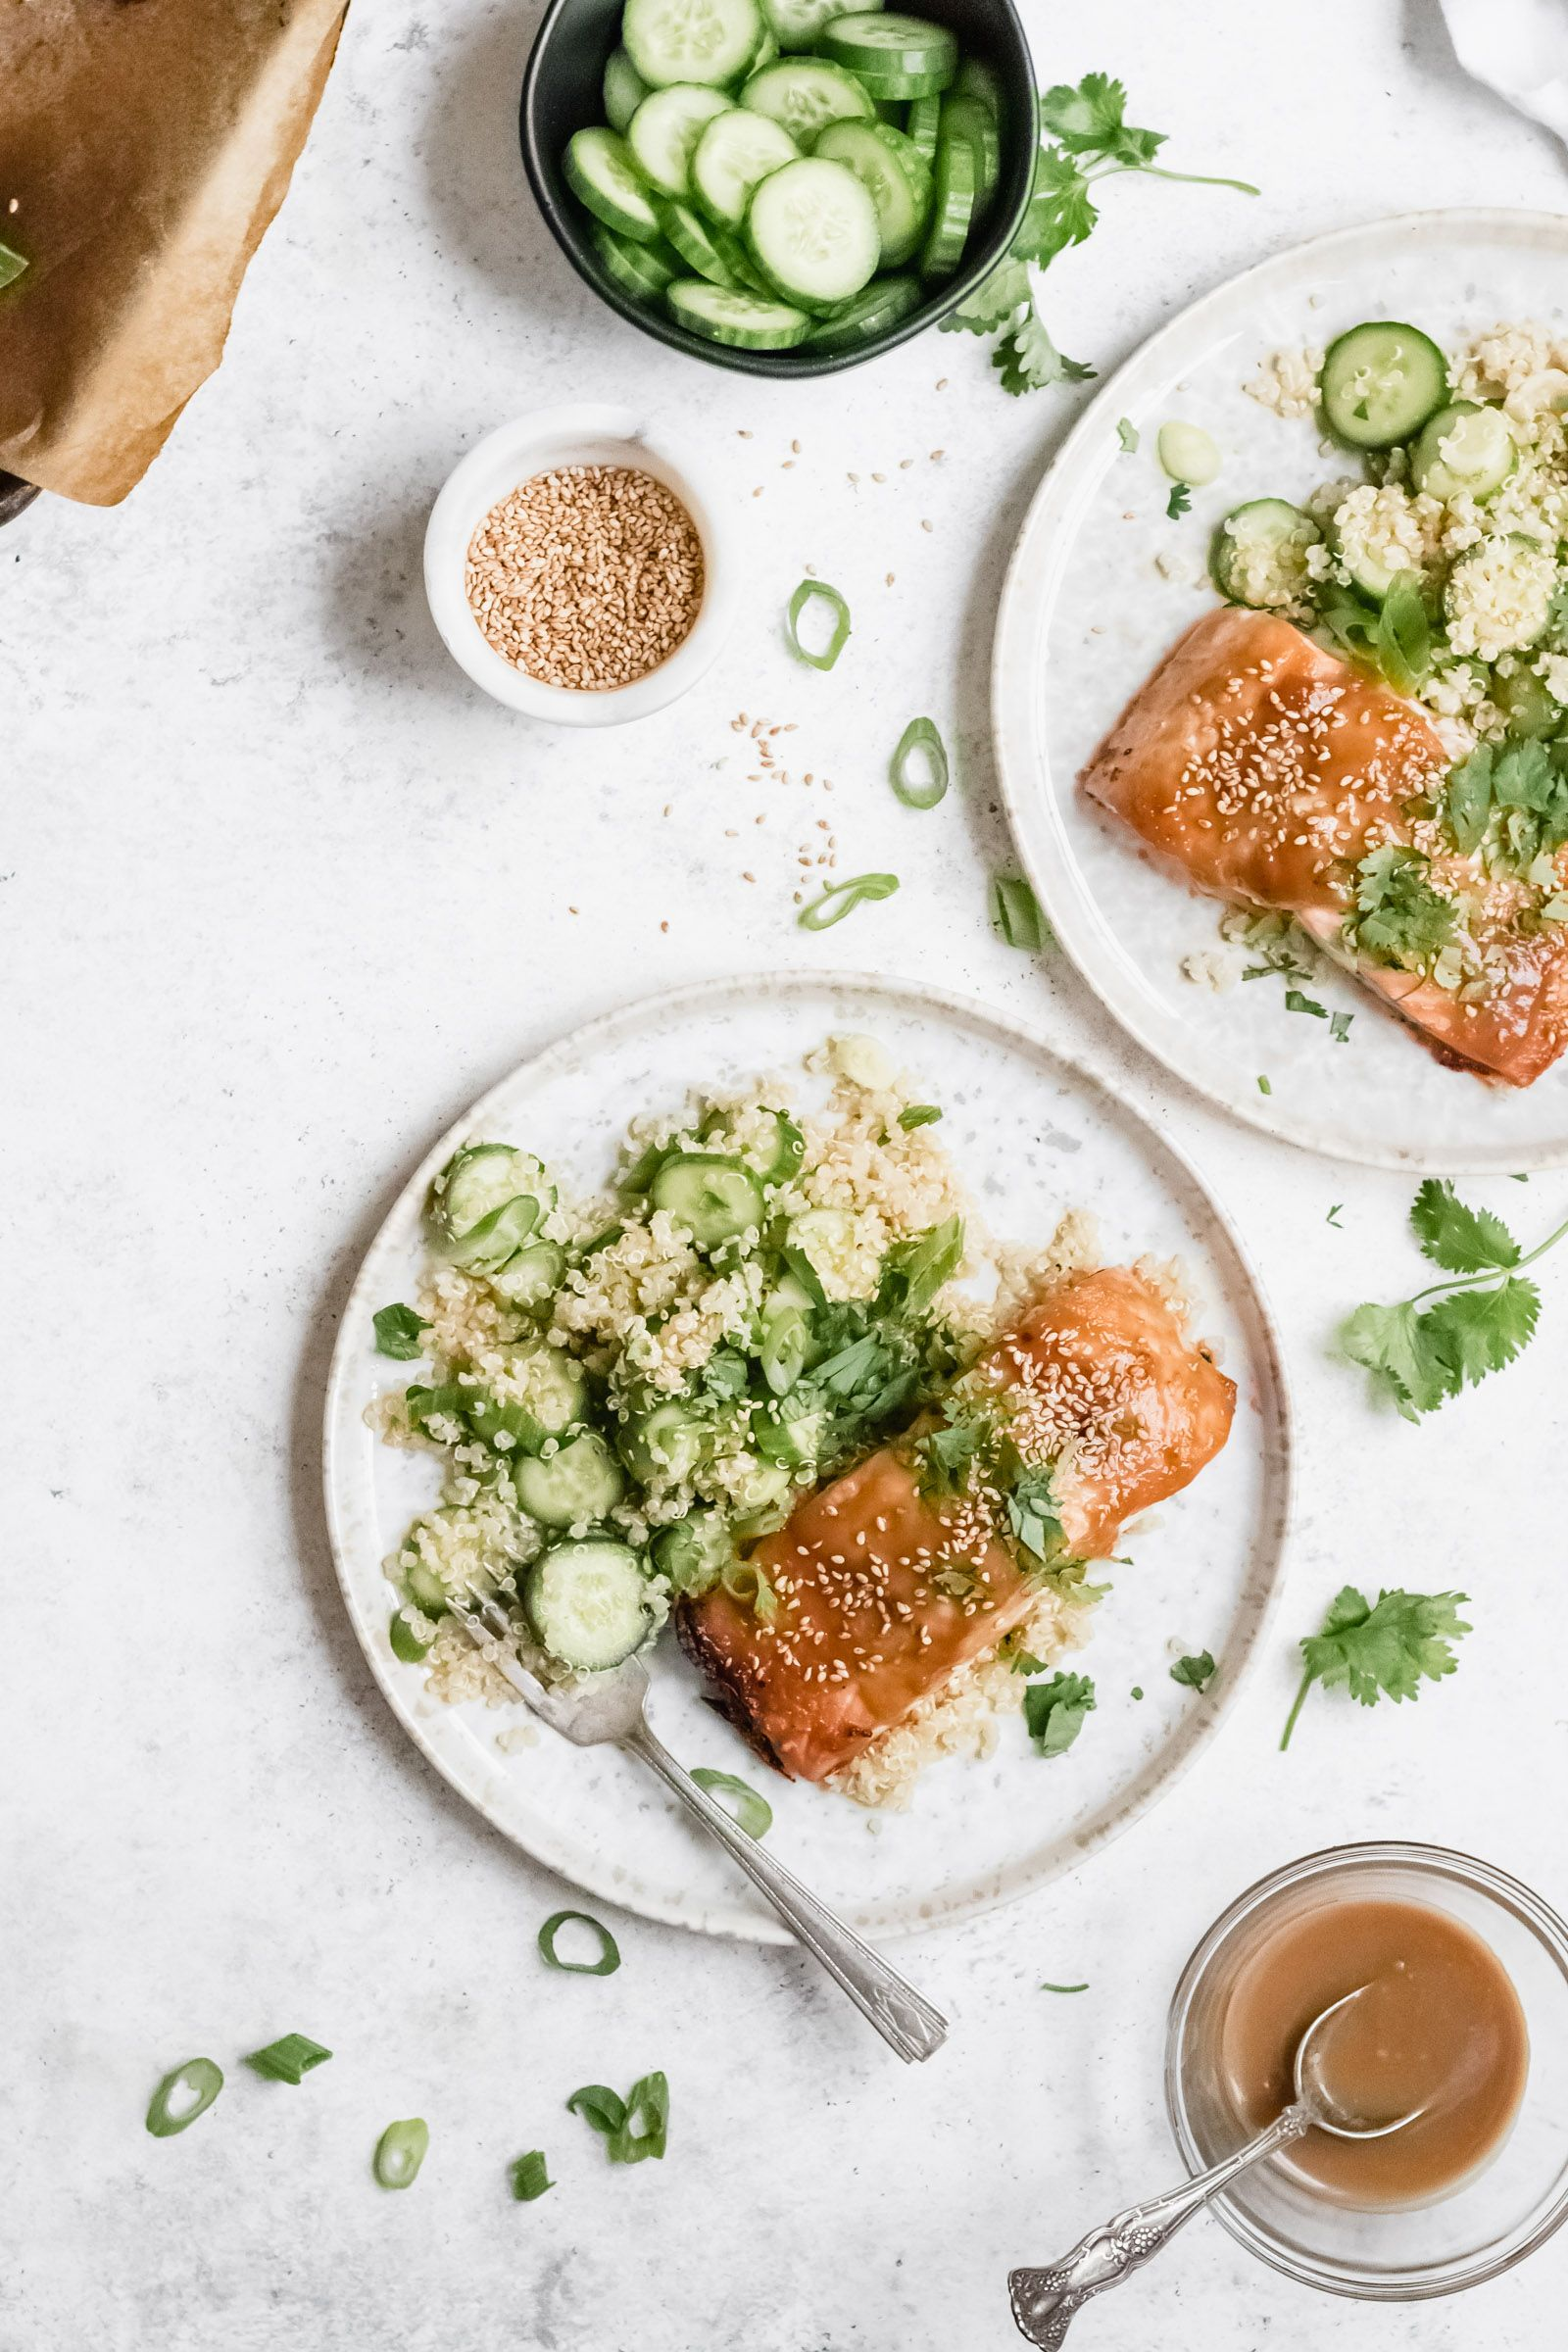 Miso Honey Glazed Salmon + Sesame Cucumber Quinoa | Well Fed Soul Miso Honey Glazed Salmon is a ten